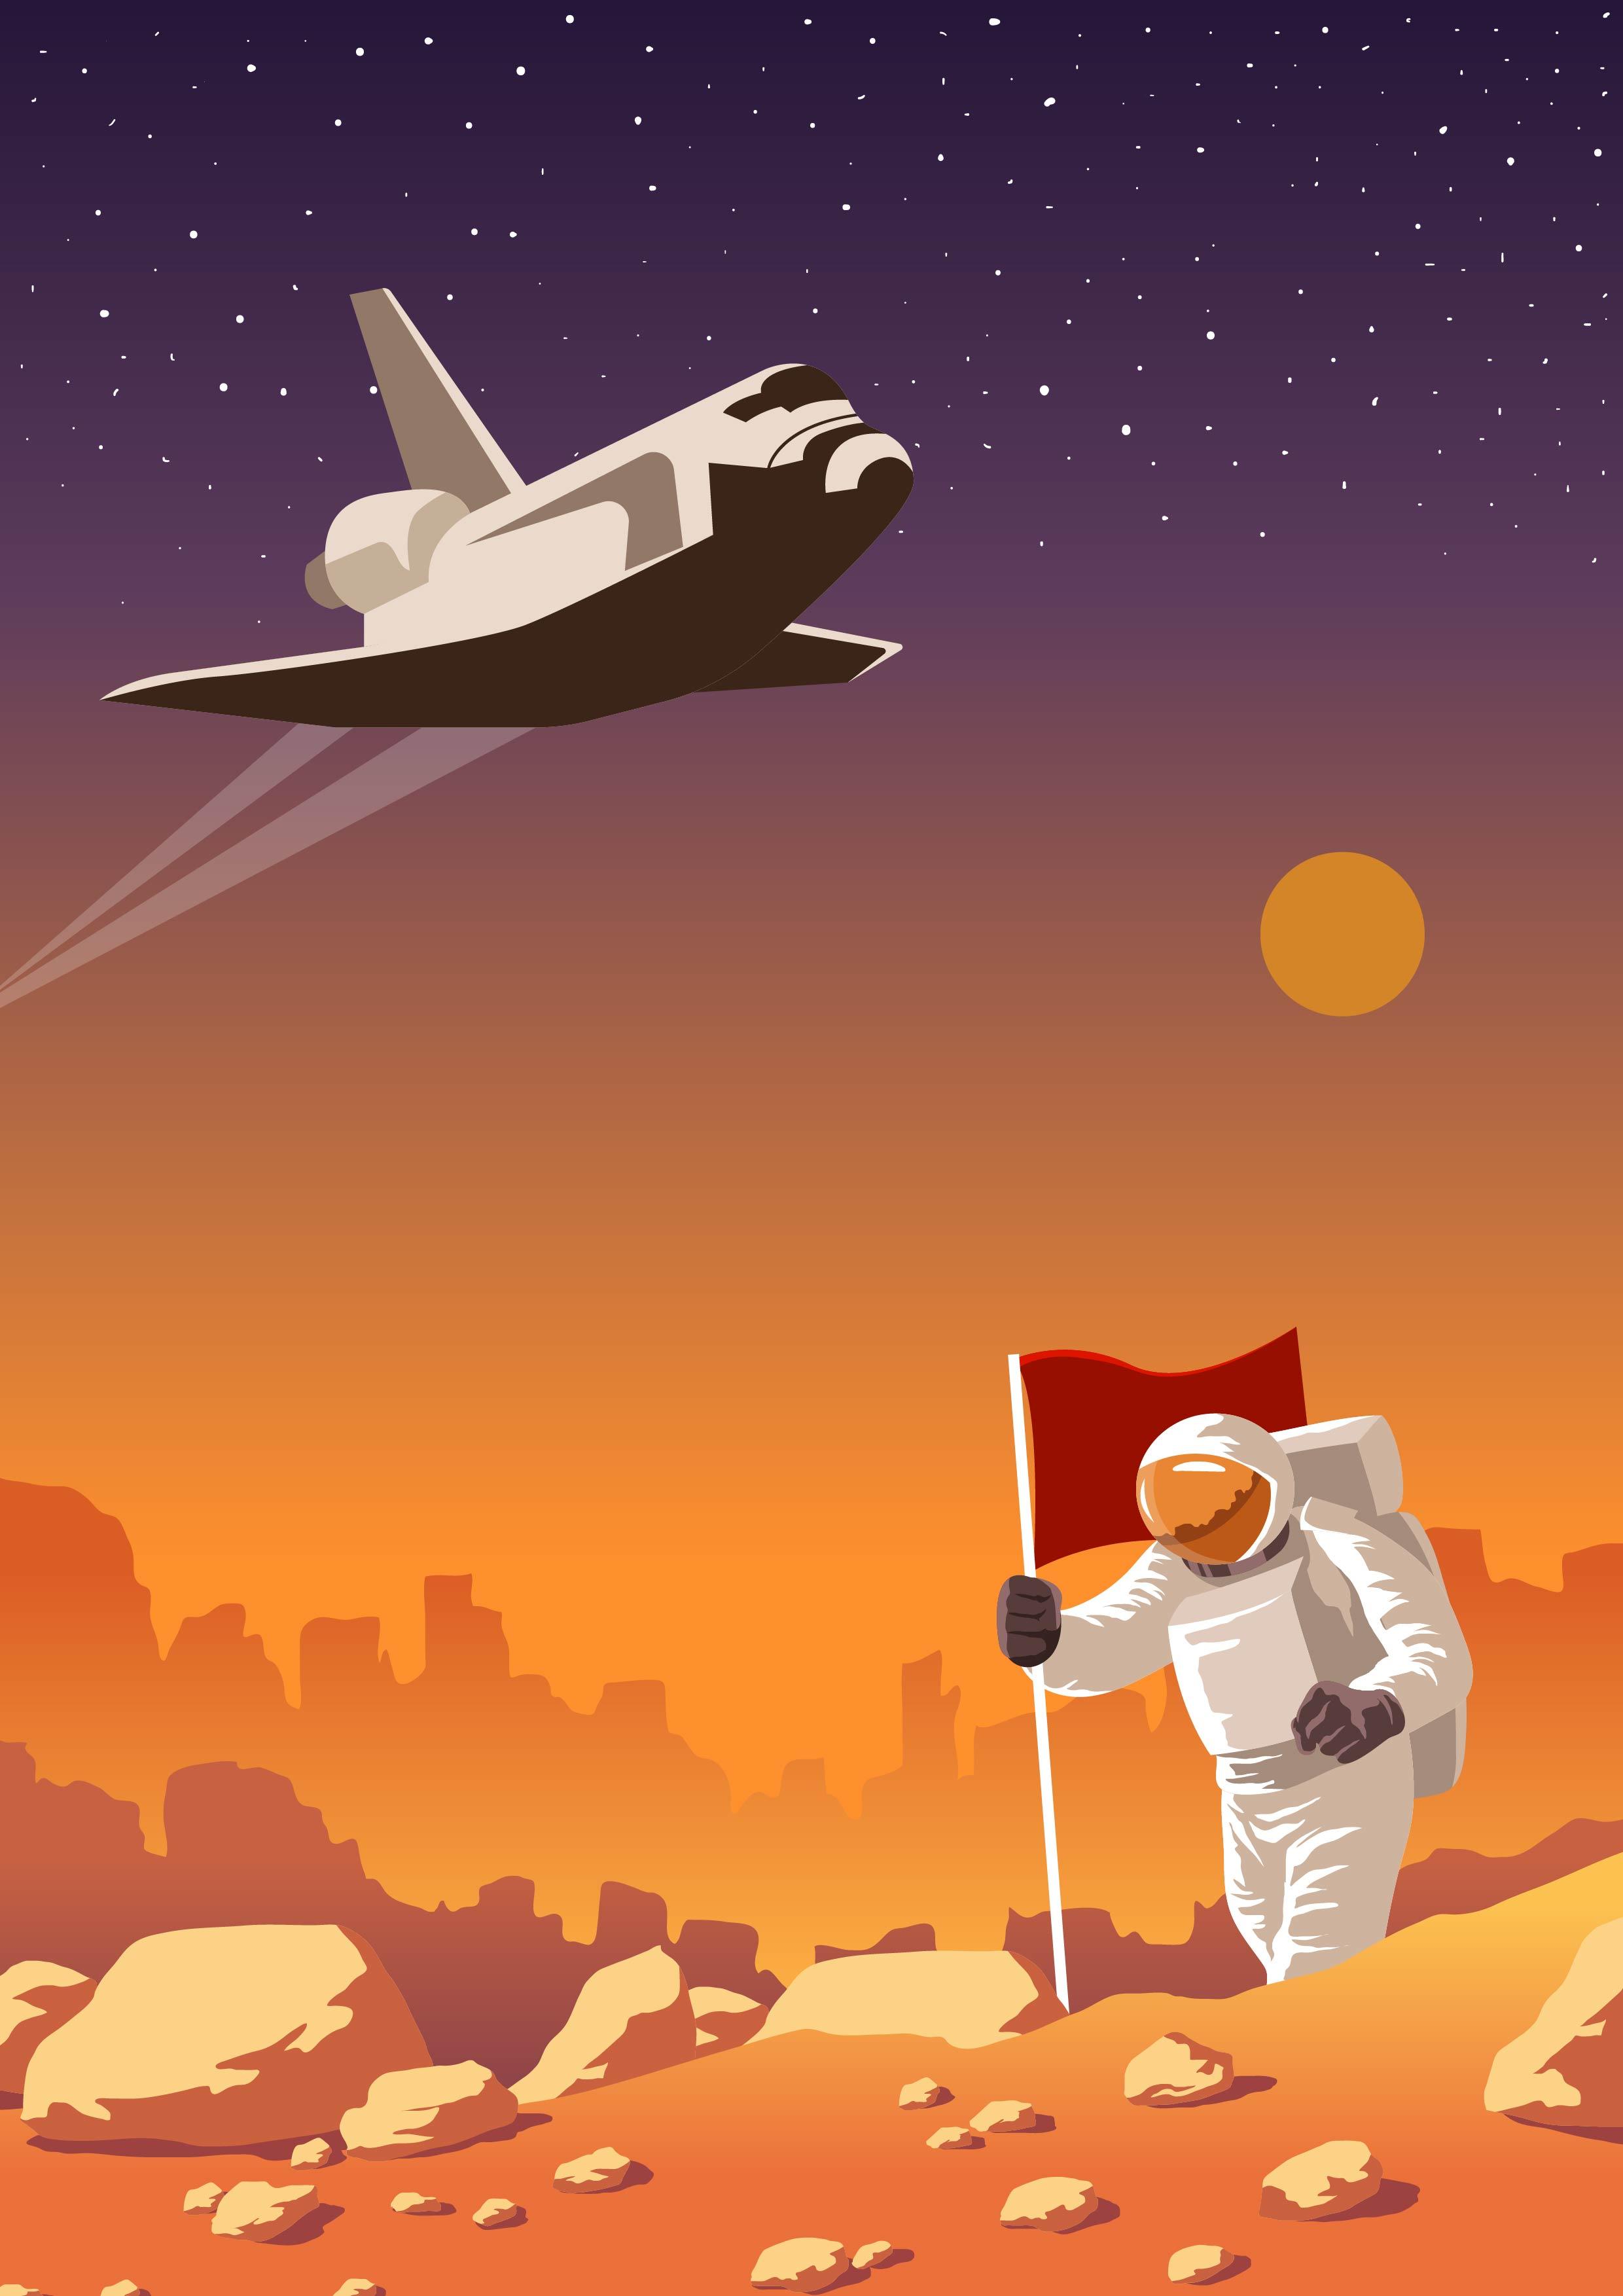 mars rover landing balloons - photo #14